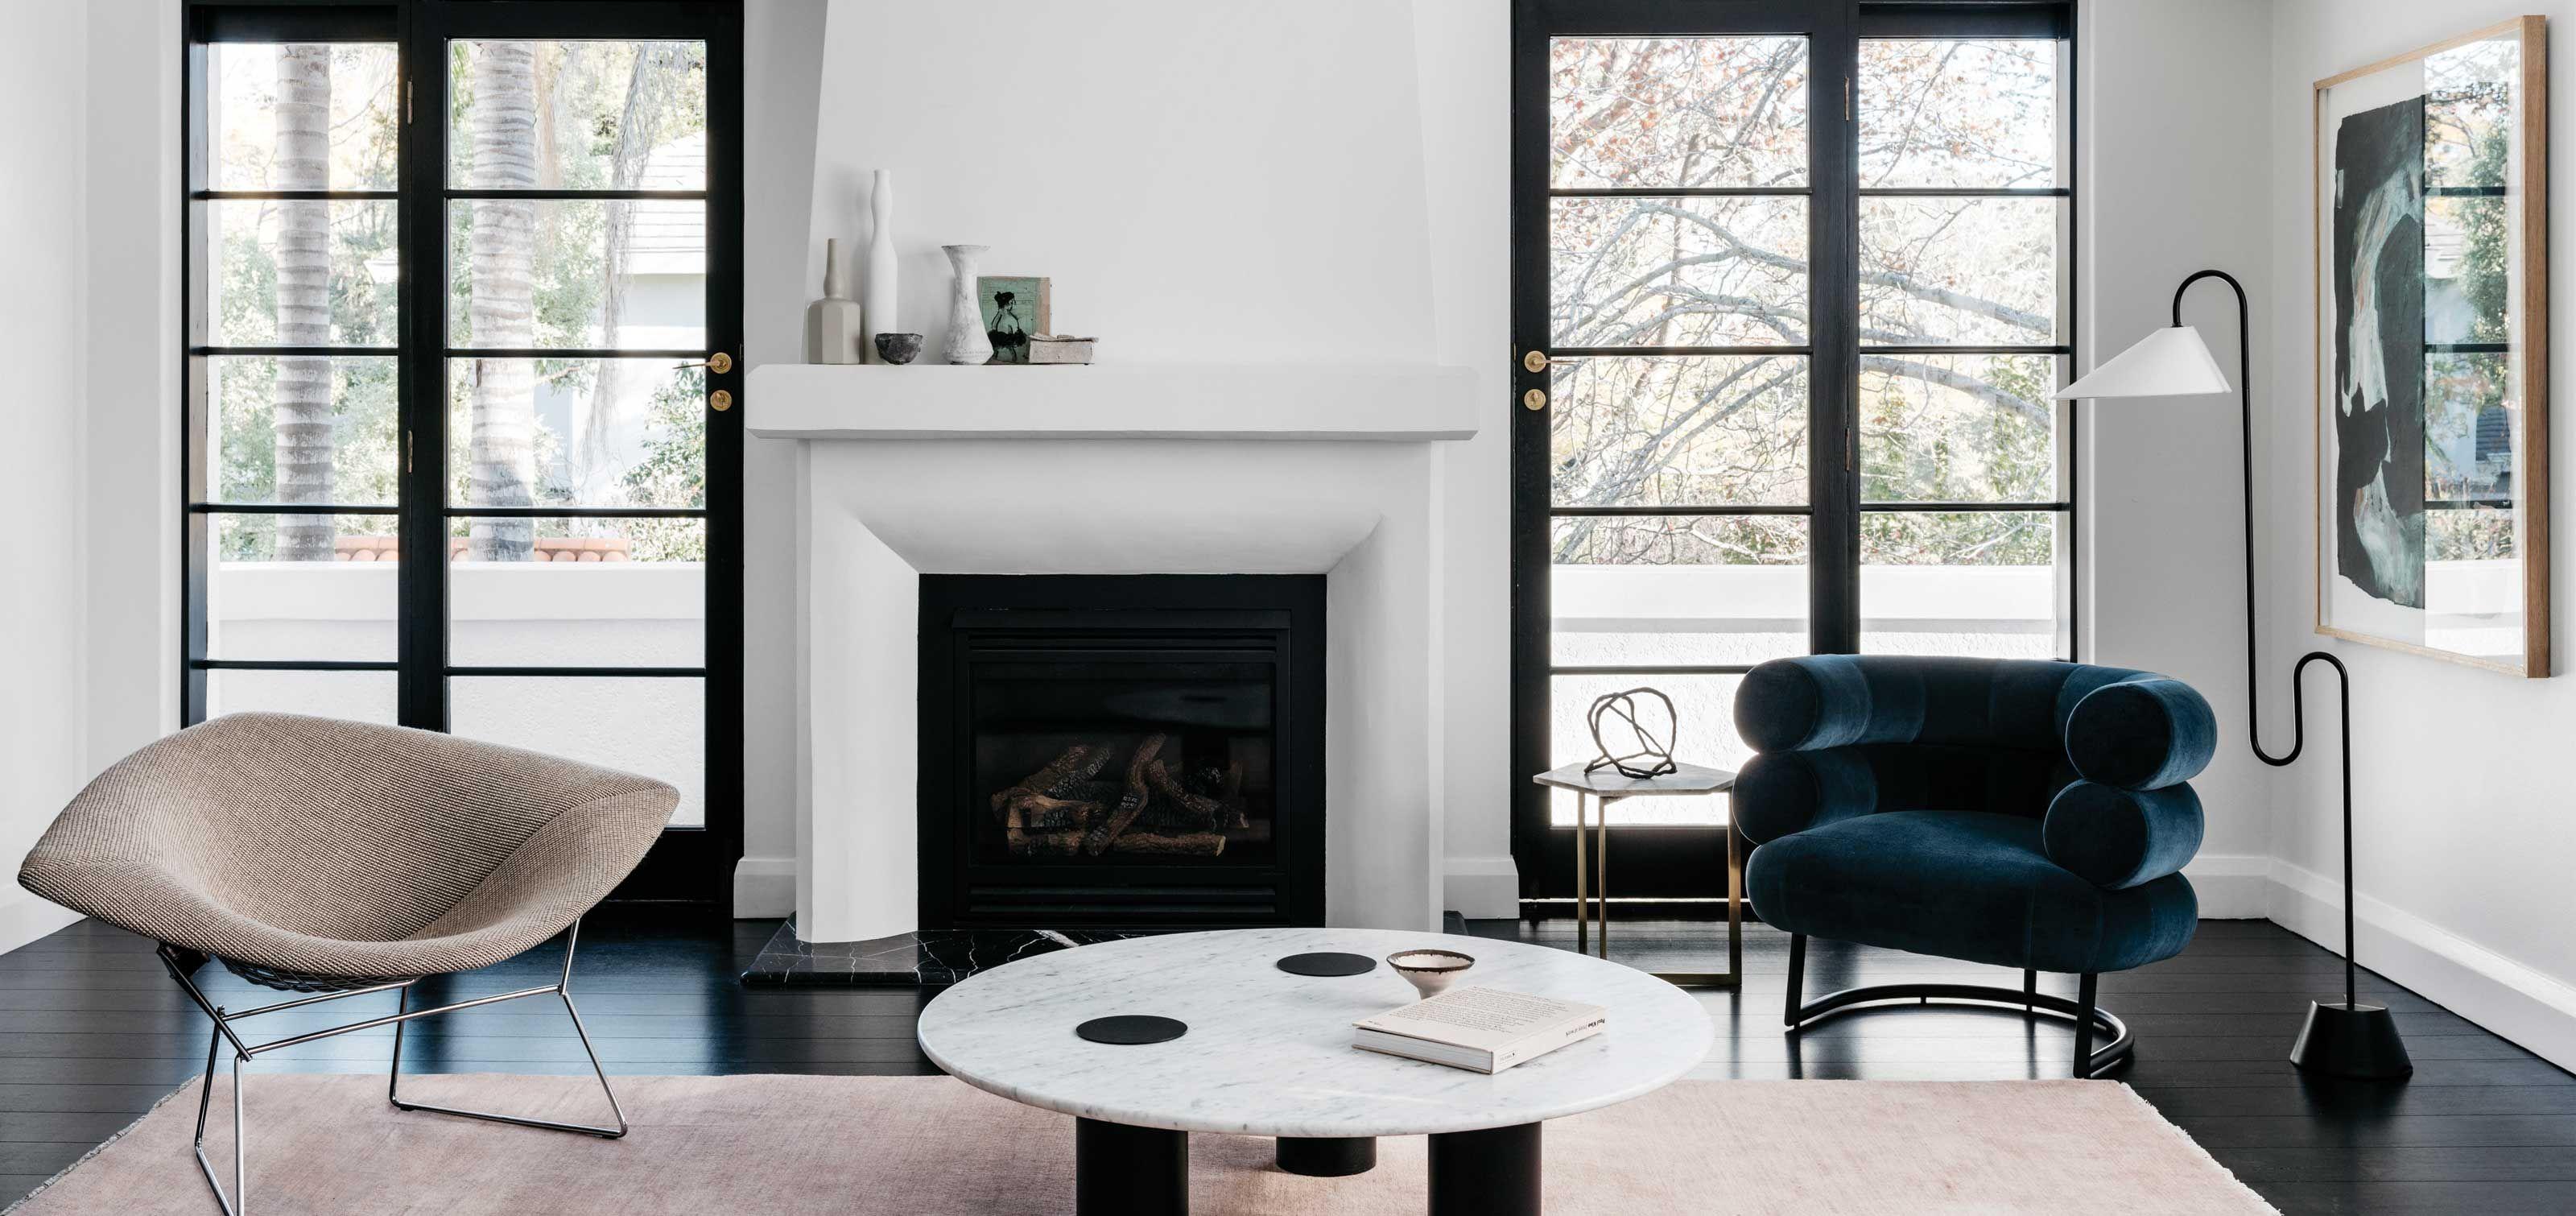 Arent Pyke Again With Images Classic Interior Interior